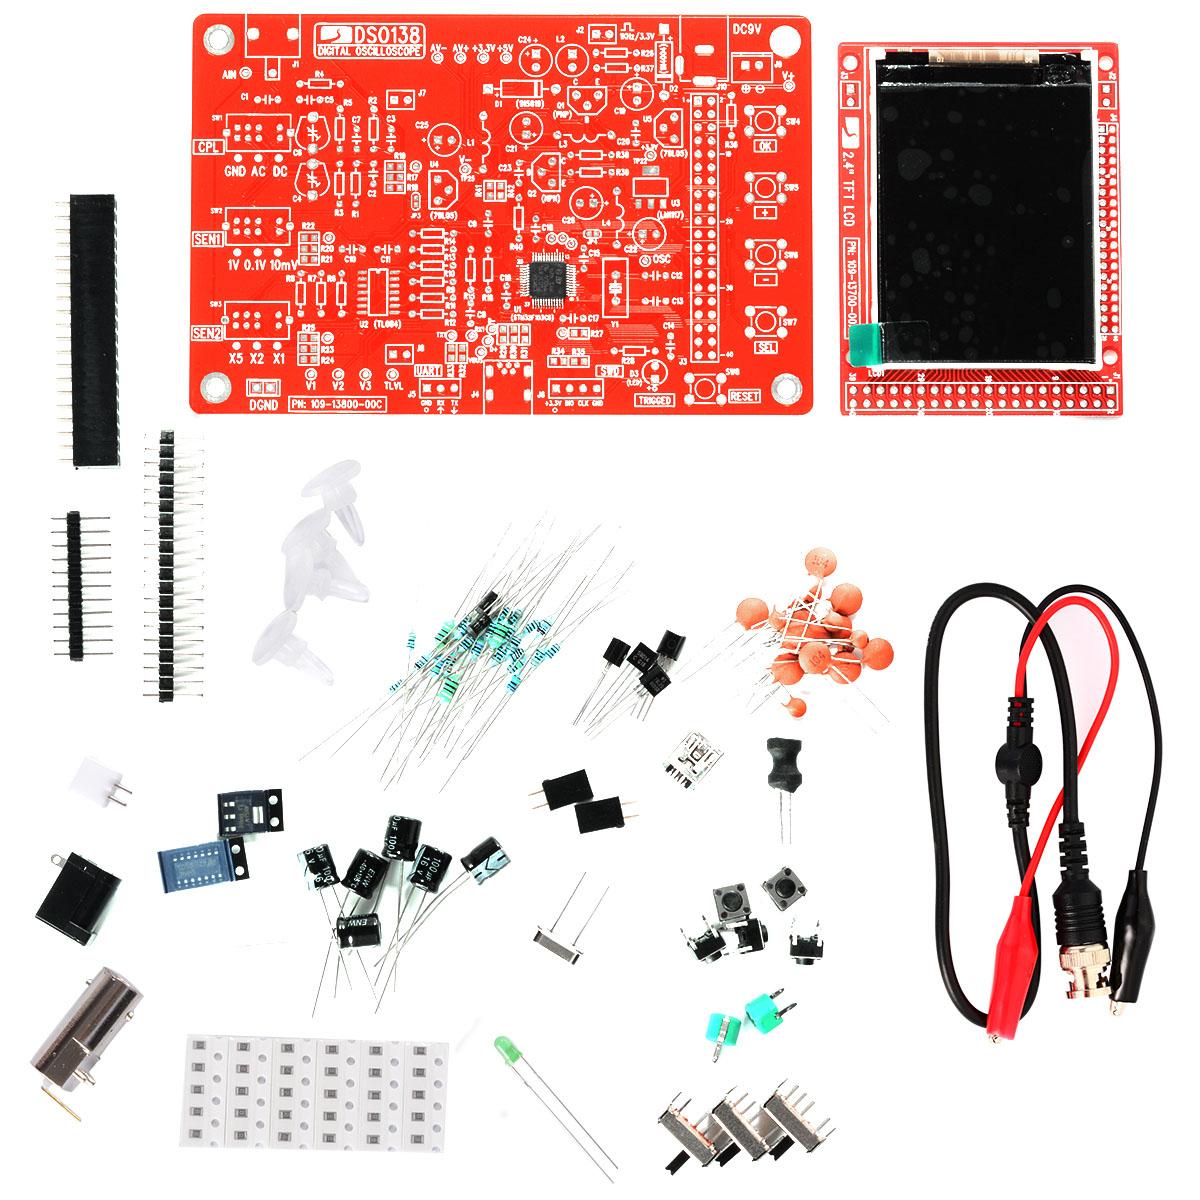 DSO138 2.4 TFT Digital Oscilloscope Kit DIY Parts ( 1Msps ) Probe STM32 TE244<br><br>Aliexpress